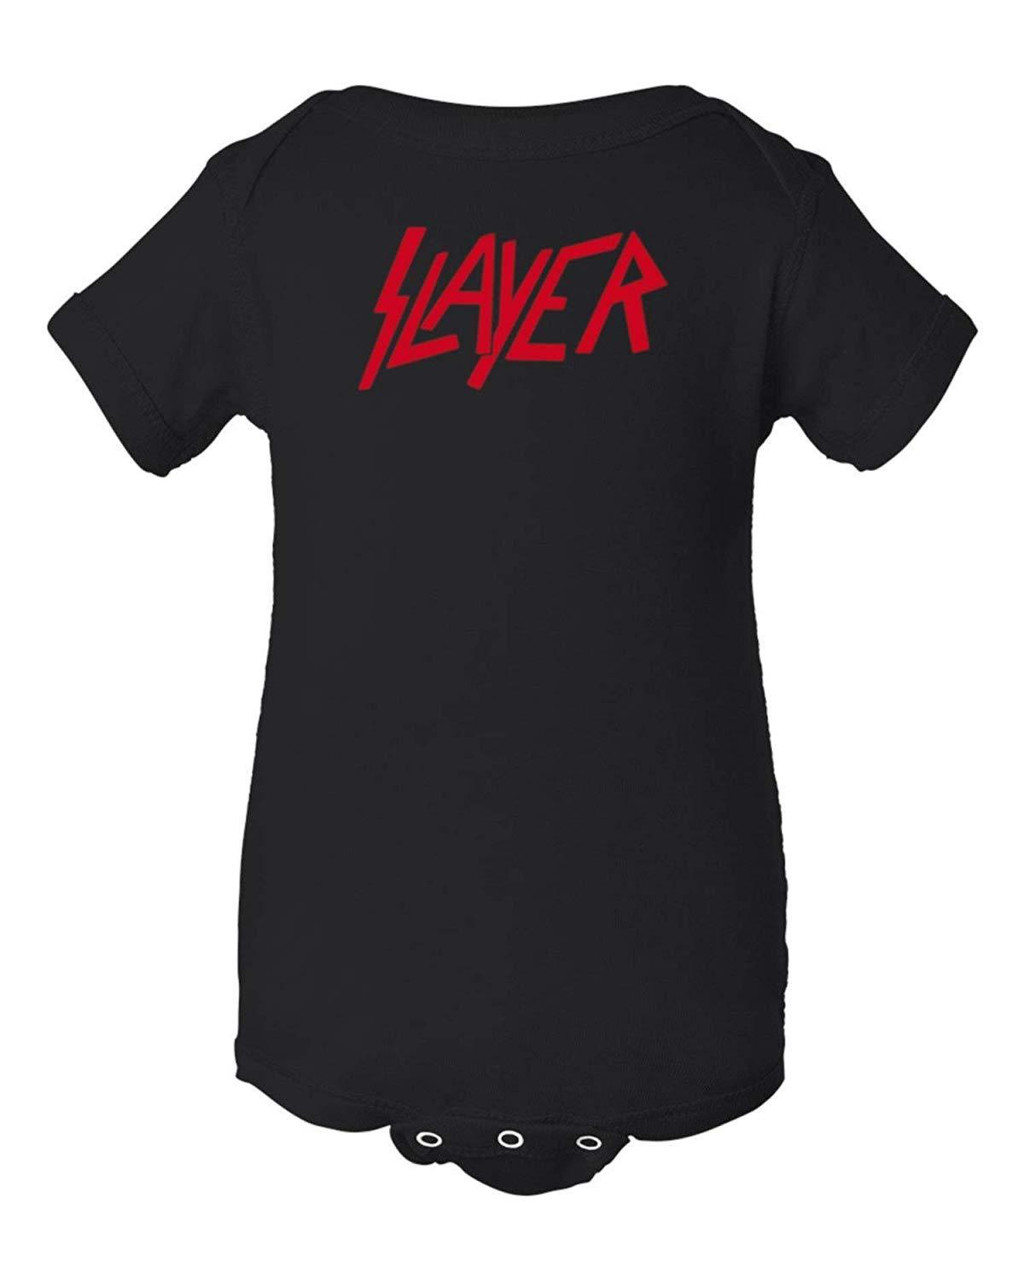 Slayer Thrash Speed Metal Rock & Roll Black Bodysuit Infant Baby Clothes